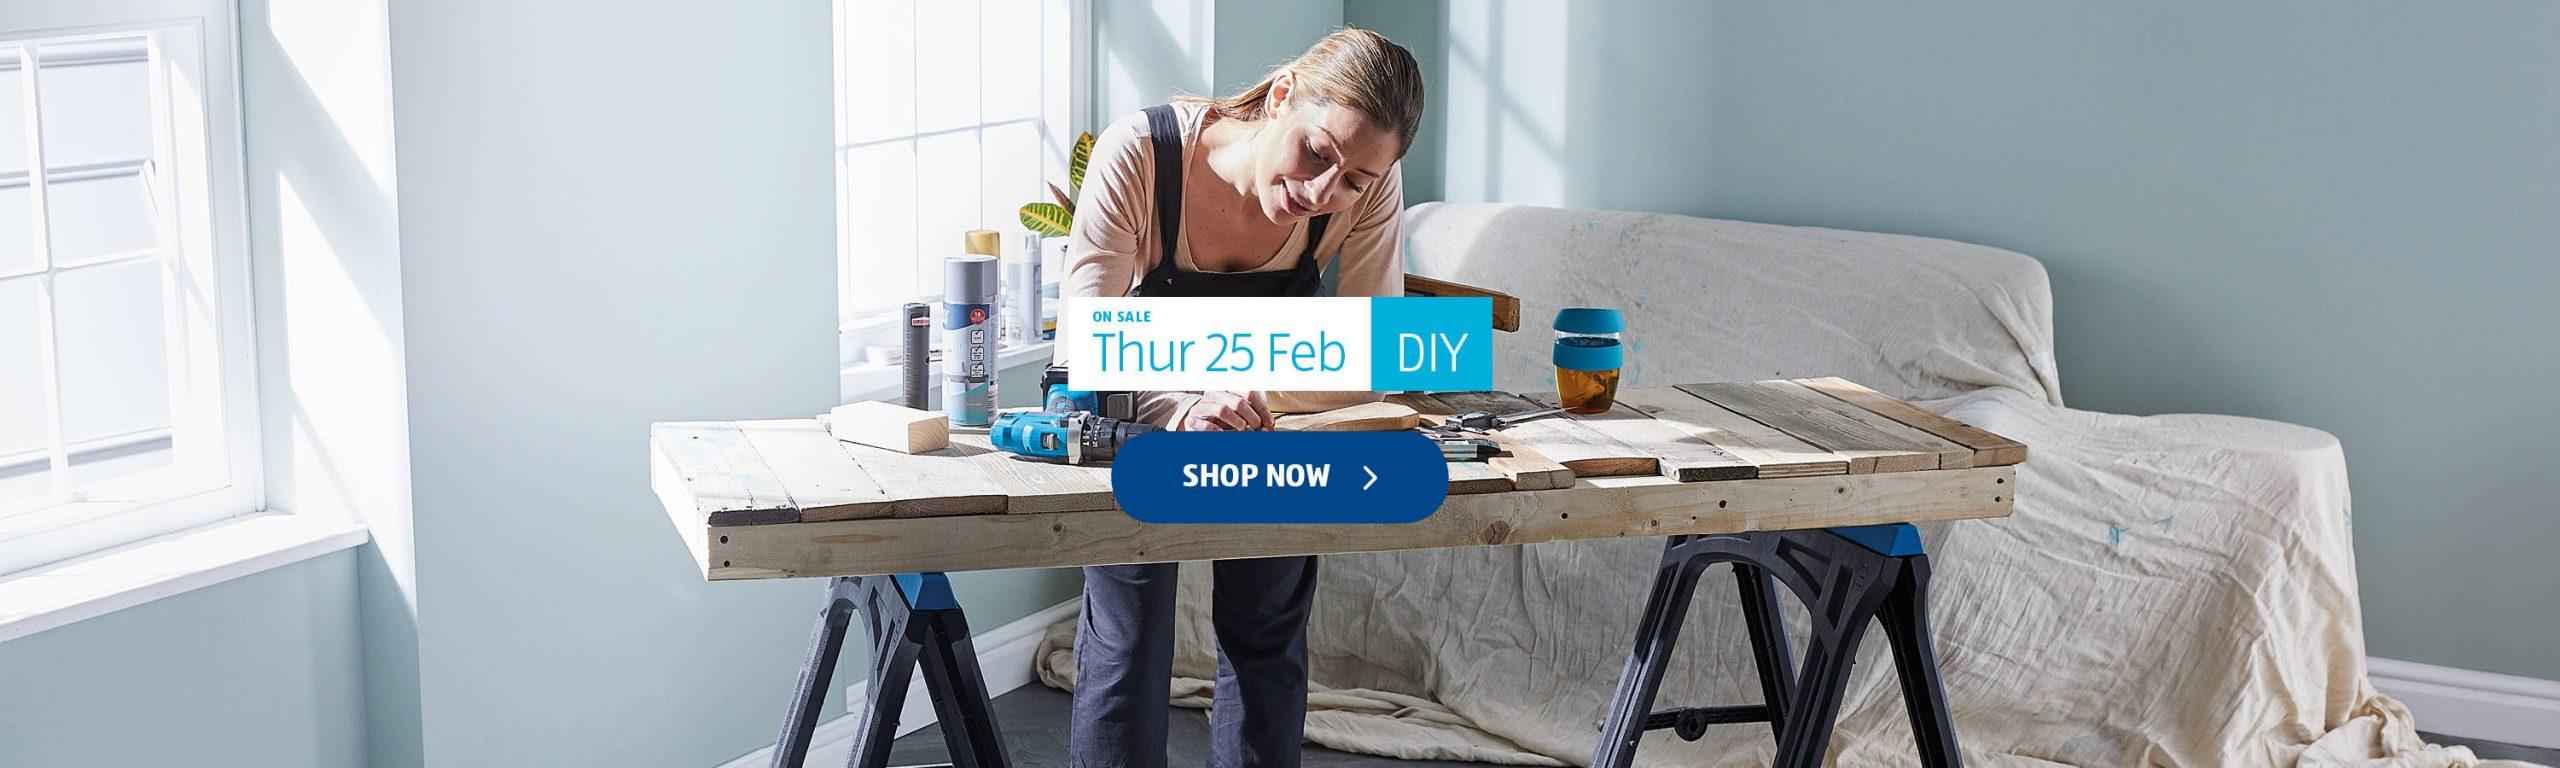 ALDI Thursday Offers 25th February 2021 ALDI DIY